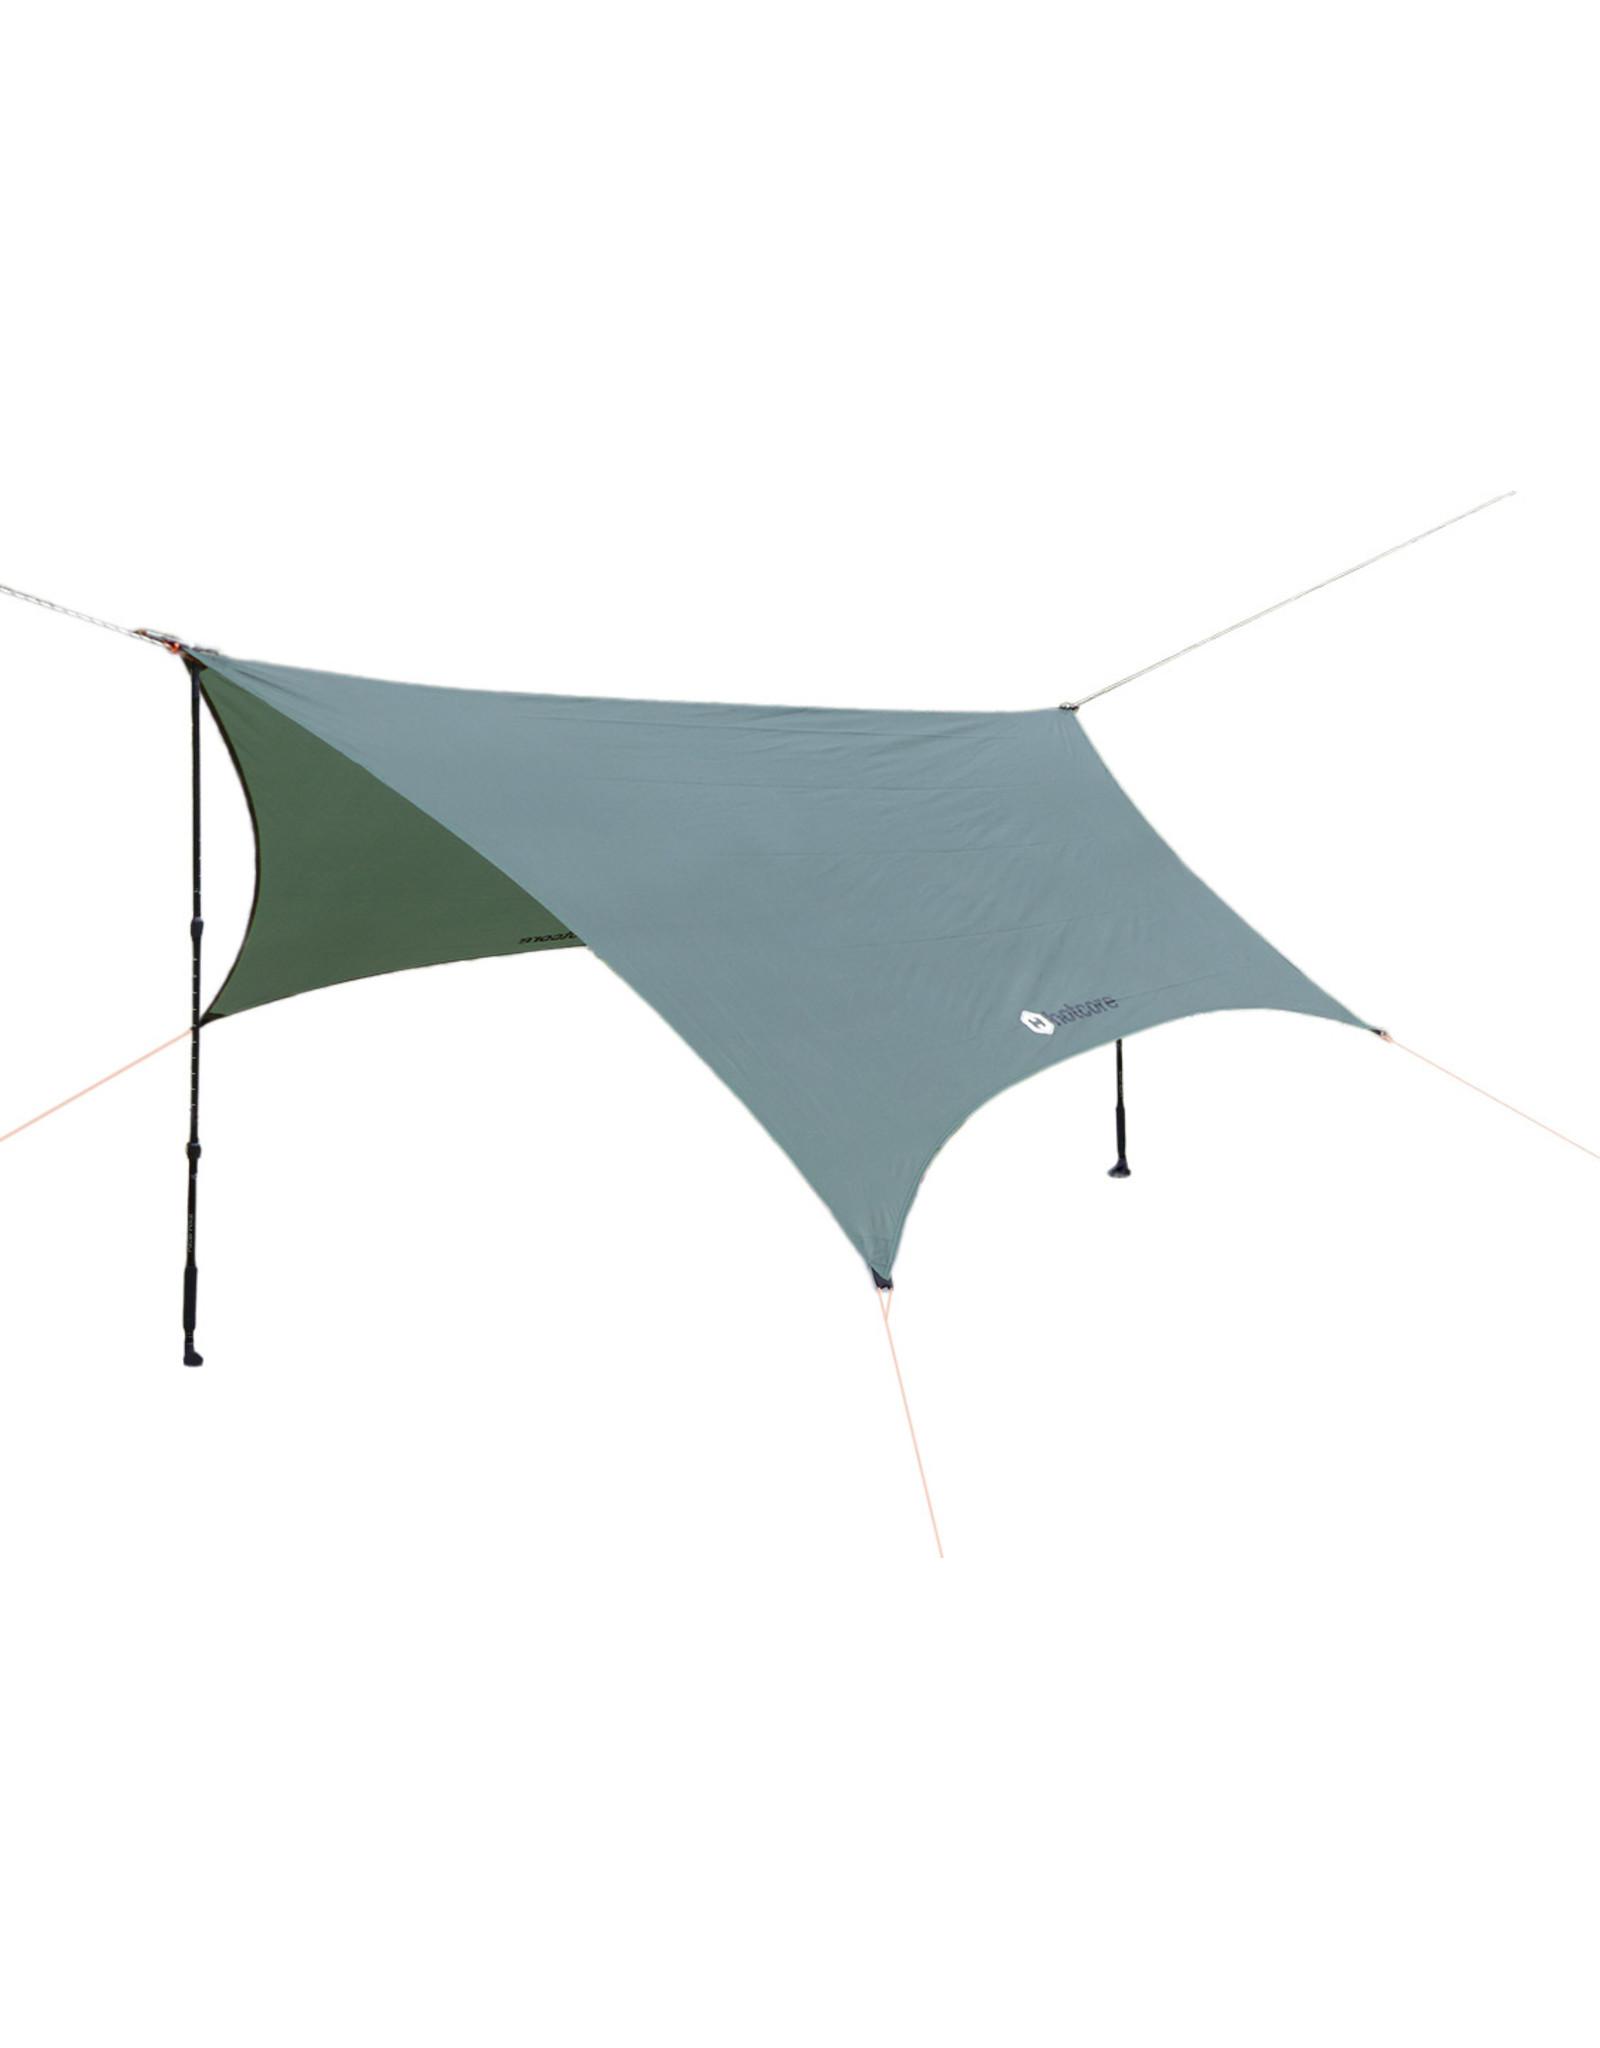 Hotcore Outdoor Products Hotcore Wingman Tarp - Small - Green